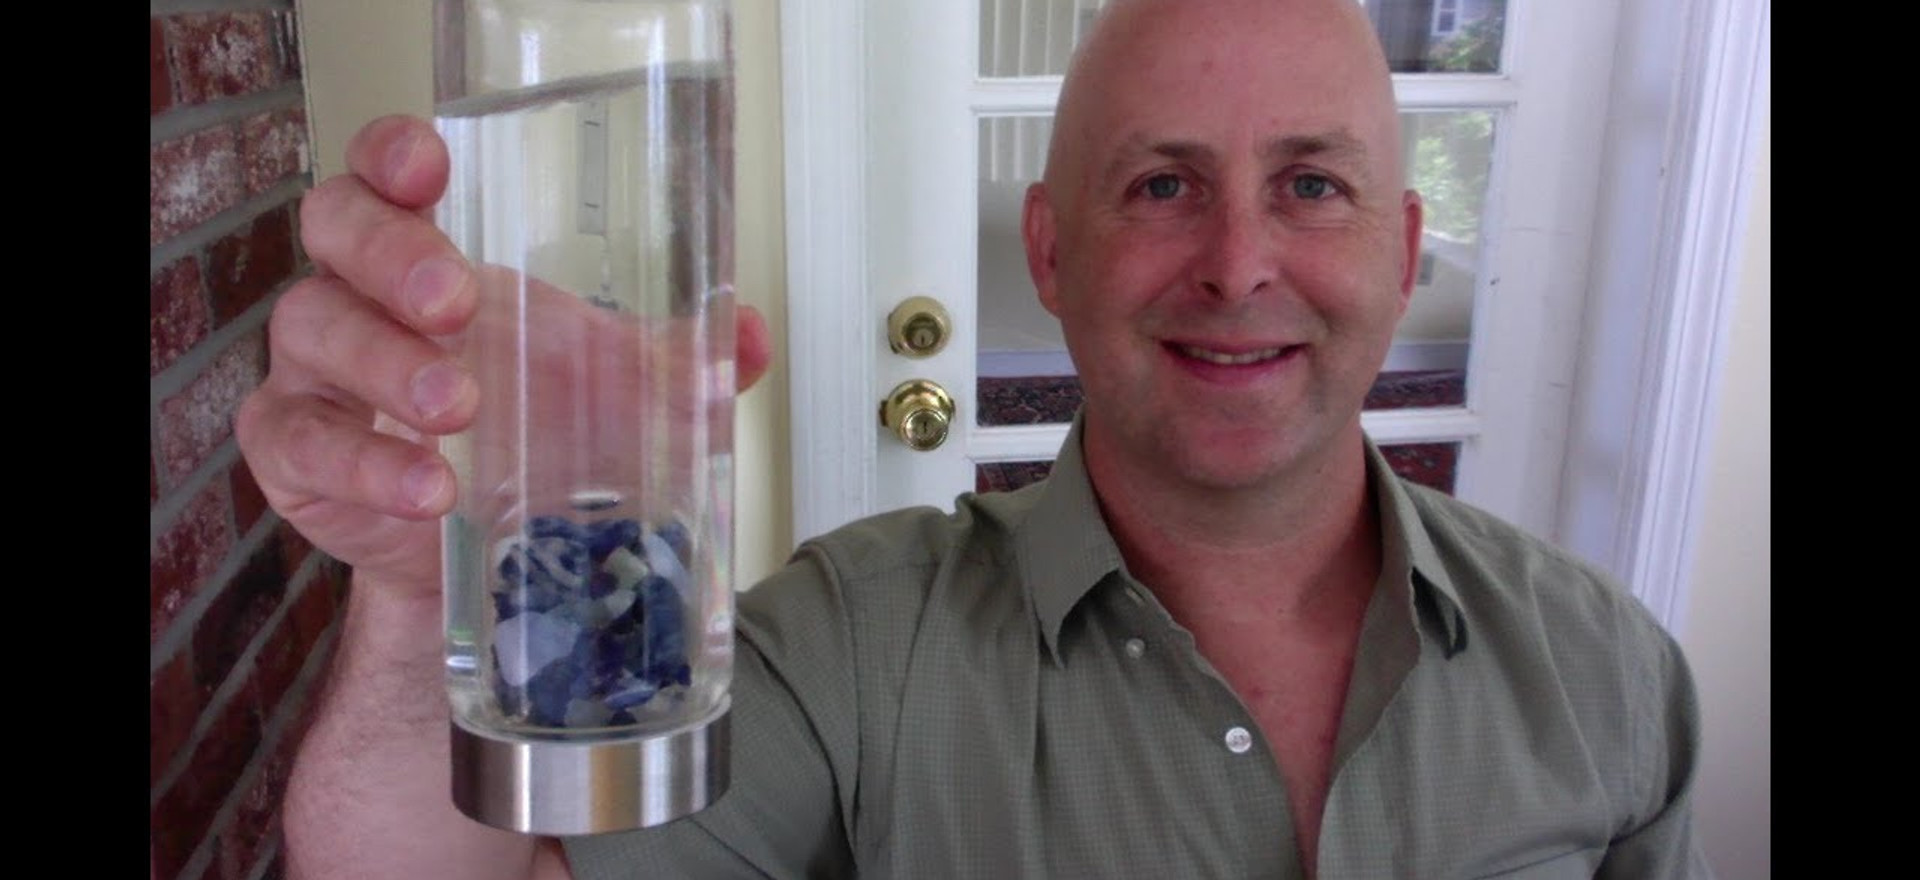 VitaJuwel's Infinity Gem Water Bottle Just Released!